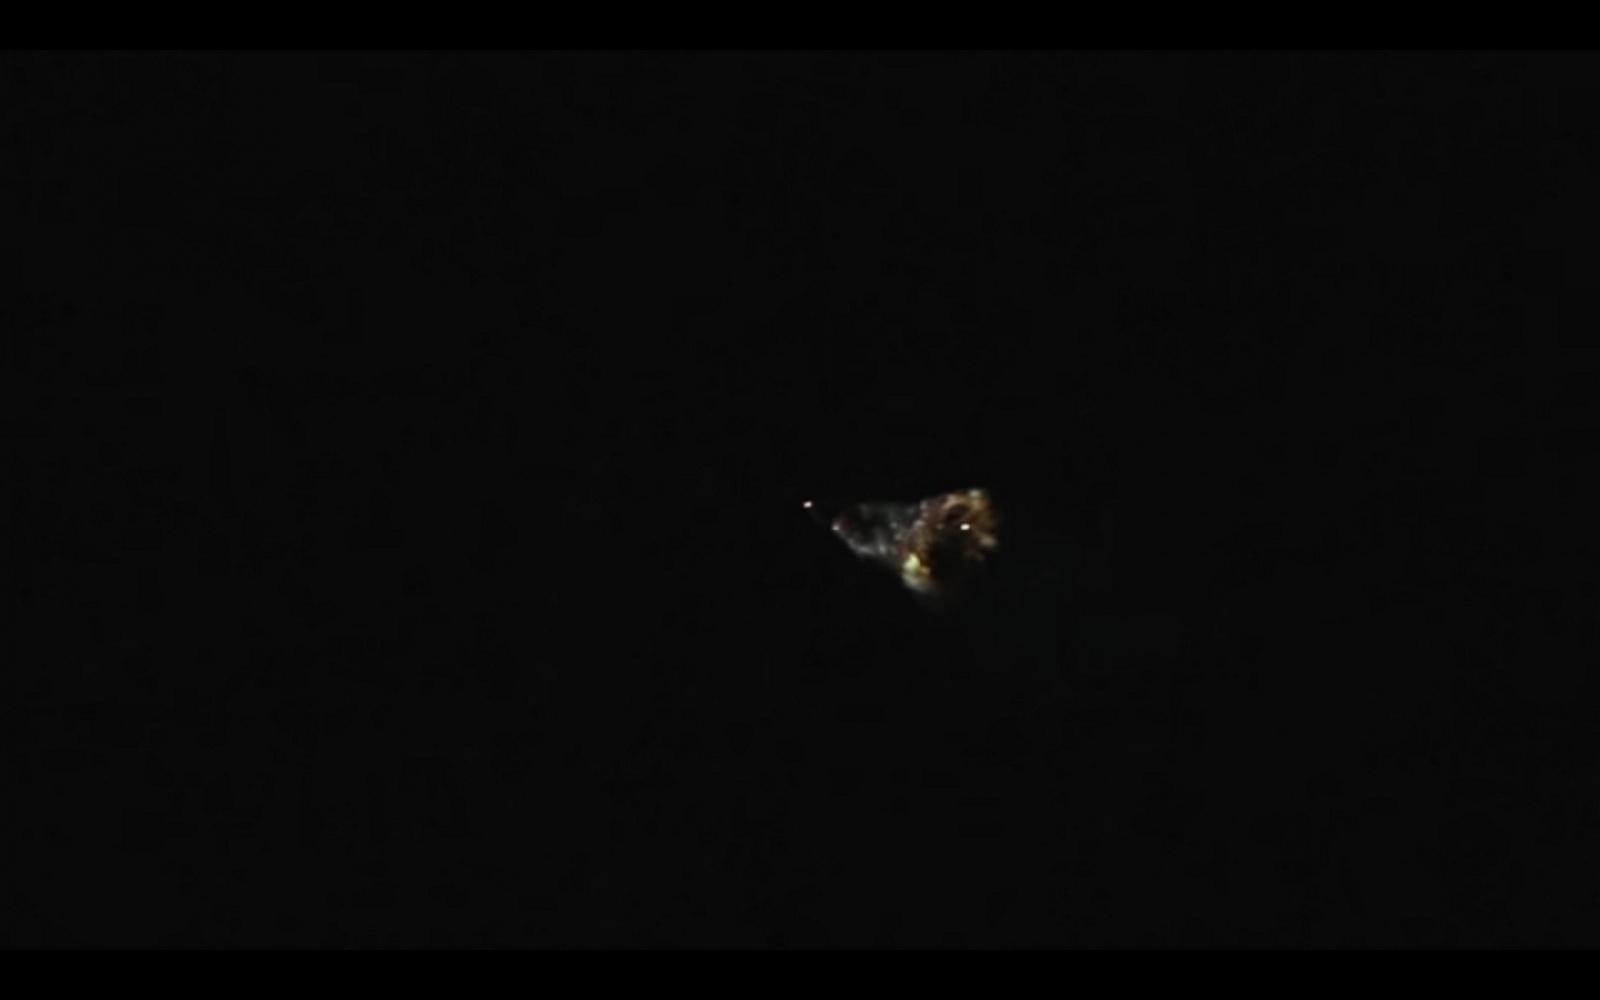 Falcon-9 (Iridium 21-30) - 09.10-17 [Succès] - Page 4 86840020171010173220